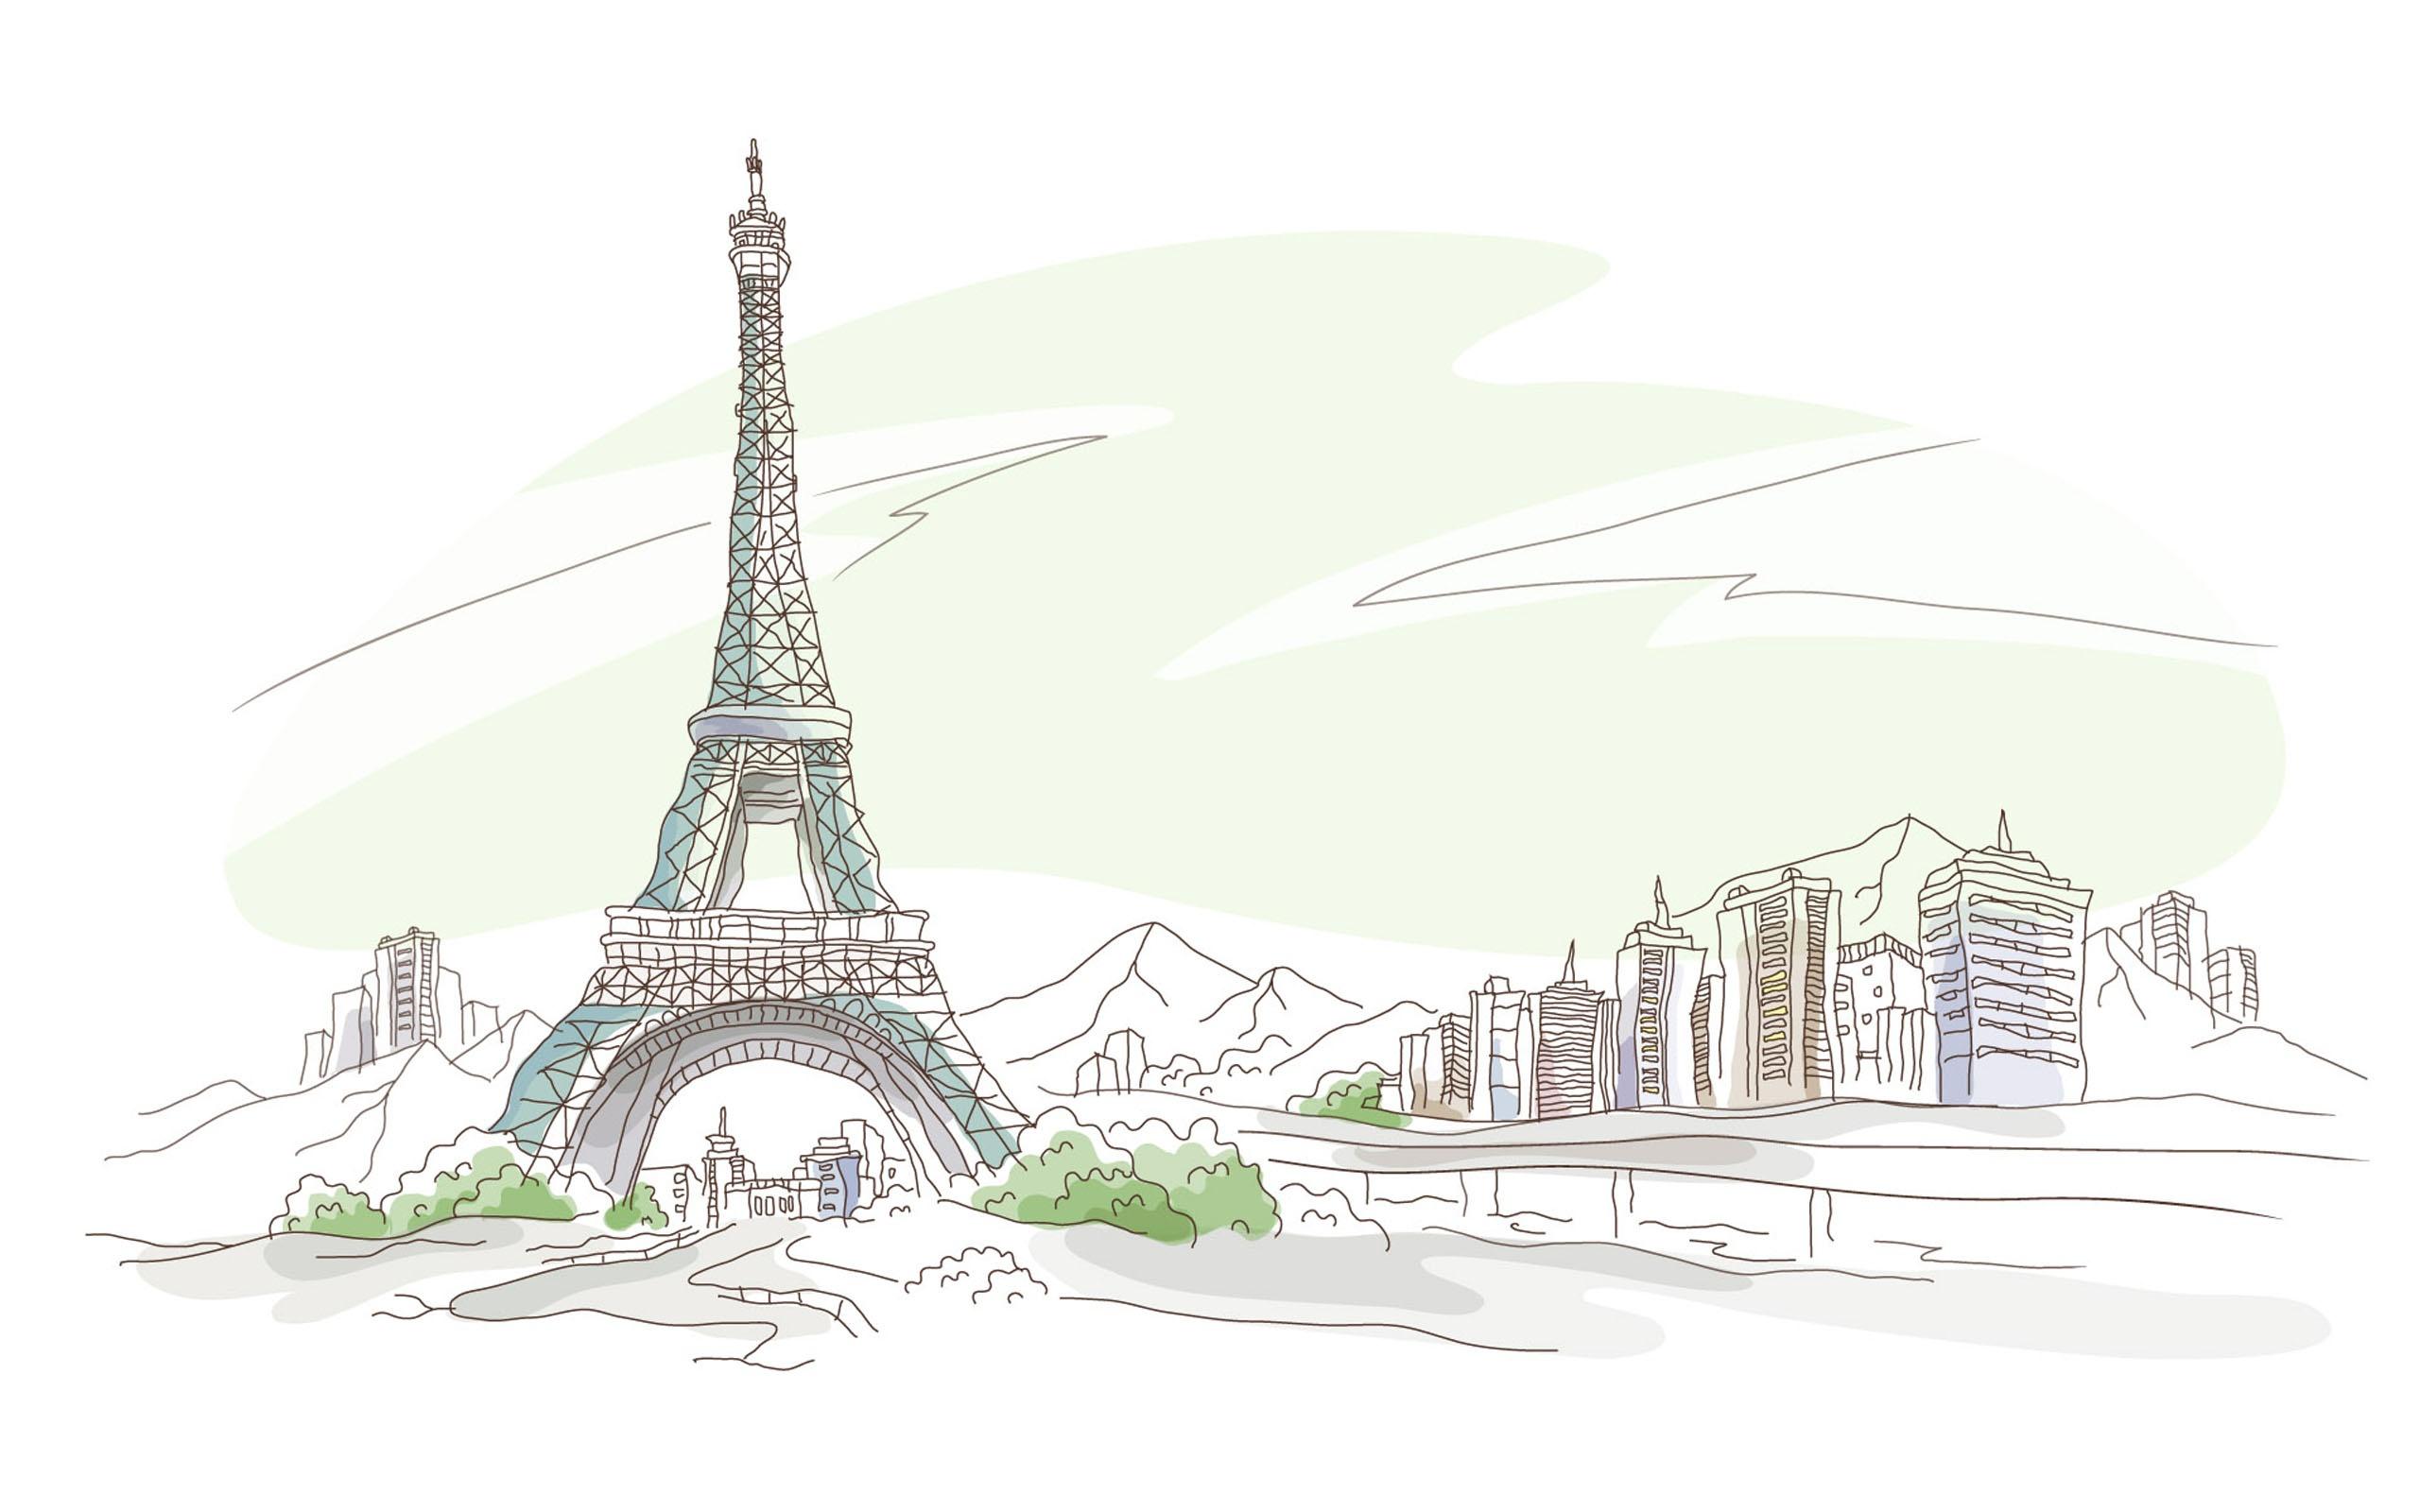 Paris pen and pencil drawing hd wallpapers widescreen 2560x1600 2560x1600